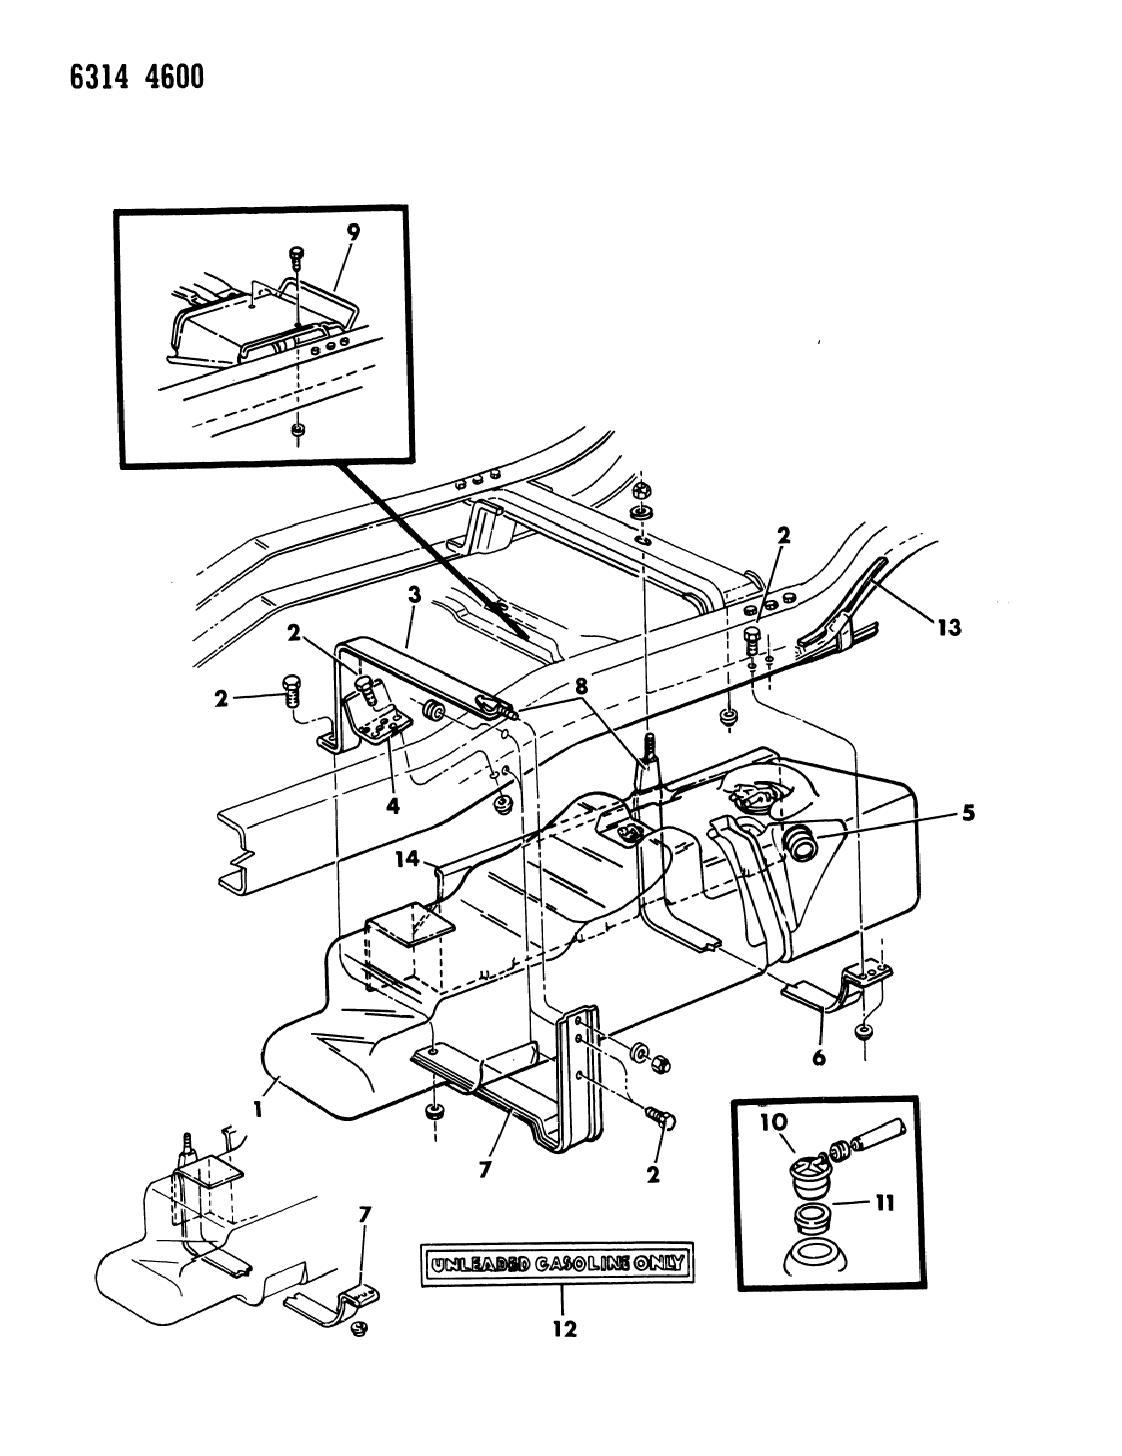 1987 Dodge Ramcharger Fuel Tank - Mopar Parts Giant on cyclone wiring diagram, malibu wiring diagram, challenger wiring diagram, regal wiring diagram, caravan wiring diagram, allante wiring diagram, w200 wiring diagram, thunderbolt wiring diagram, charger wiring diagram, d150 wiring diagram, explorer wiring diagram, chrysler wiring diagram, van wiring diagram, vip wiring diagram, ram wiring diagram, viper wiring diagram, tracker wiring diagram, suburban wiring diagram, pickup wiring diagram, dakota wiring diagram,